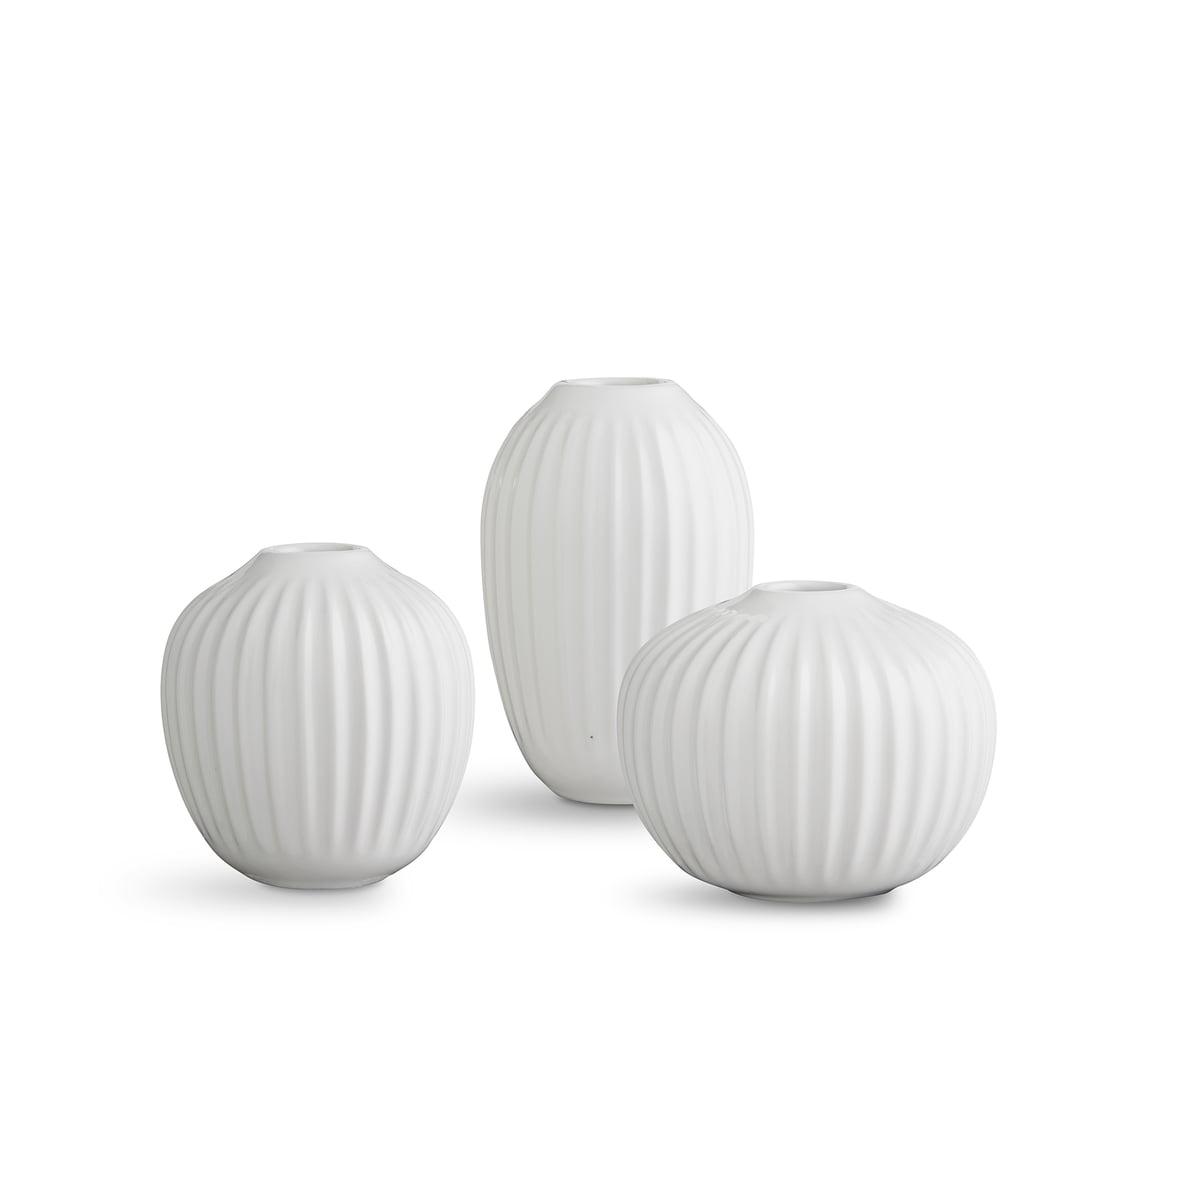 Kaehler design hammershoi vase miniatur weiss 3er set freisteller